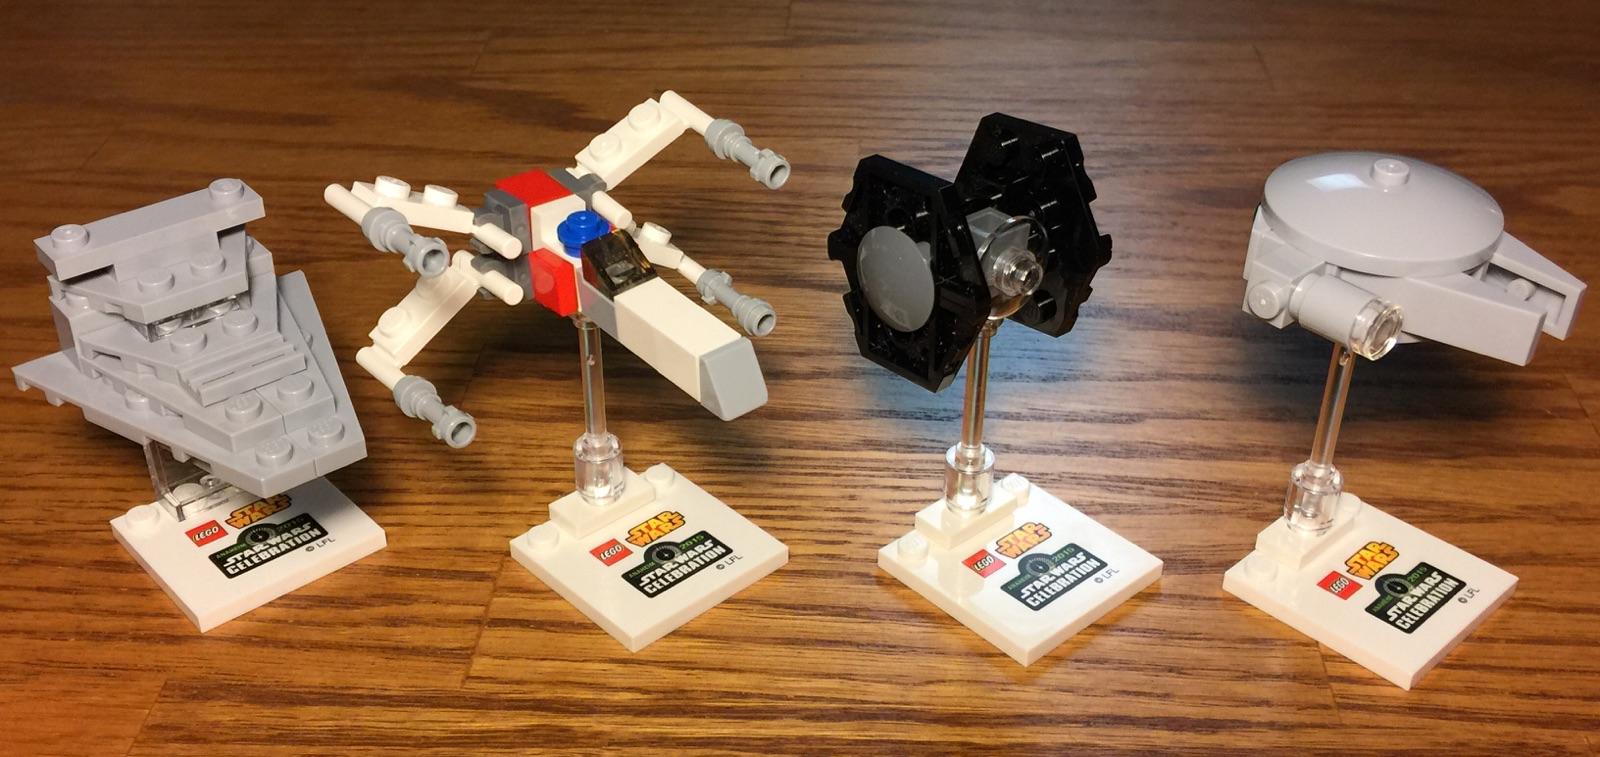 Star Wars Celebration  Exclusives Lego Mini Builds